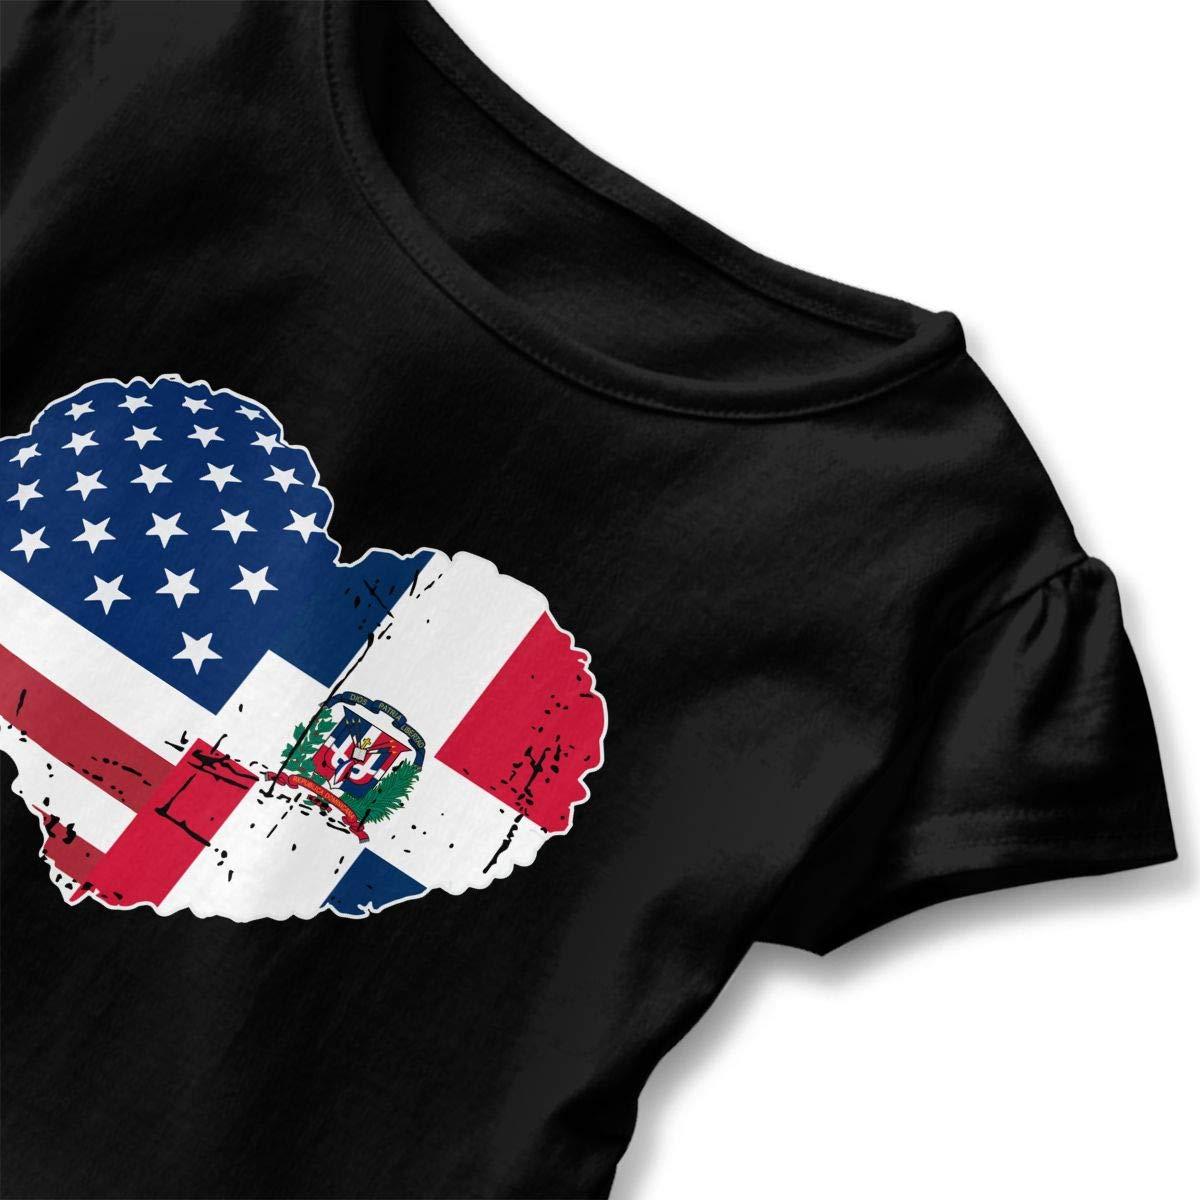 SHIRT1-KIDS Dominican Republic USA Flag Heart Toddler//Infant Girls Short Sleeve T Shirts Ruffles Shirt Tee for 2-6T